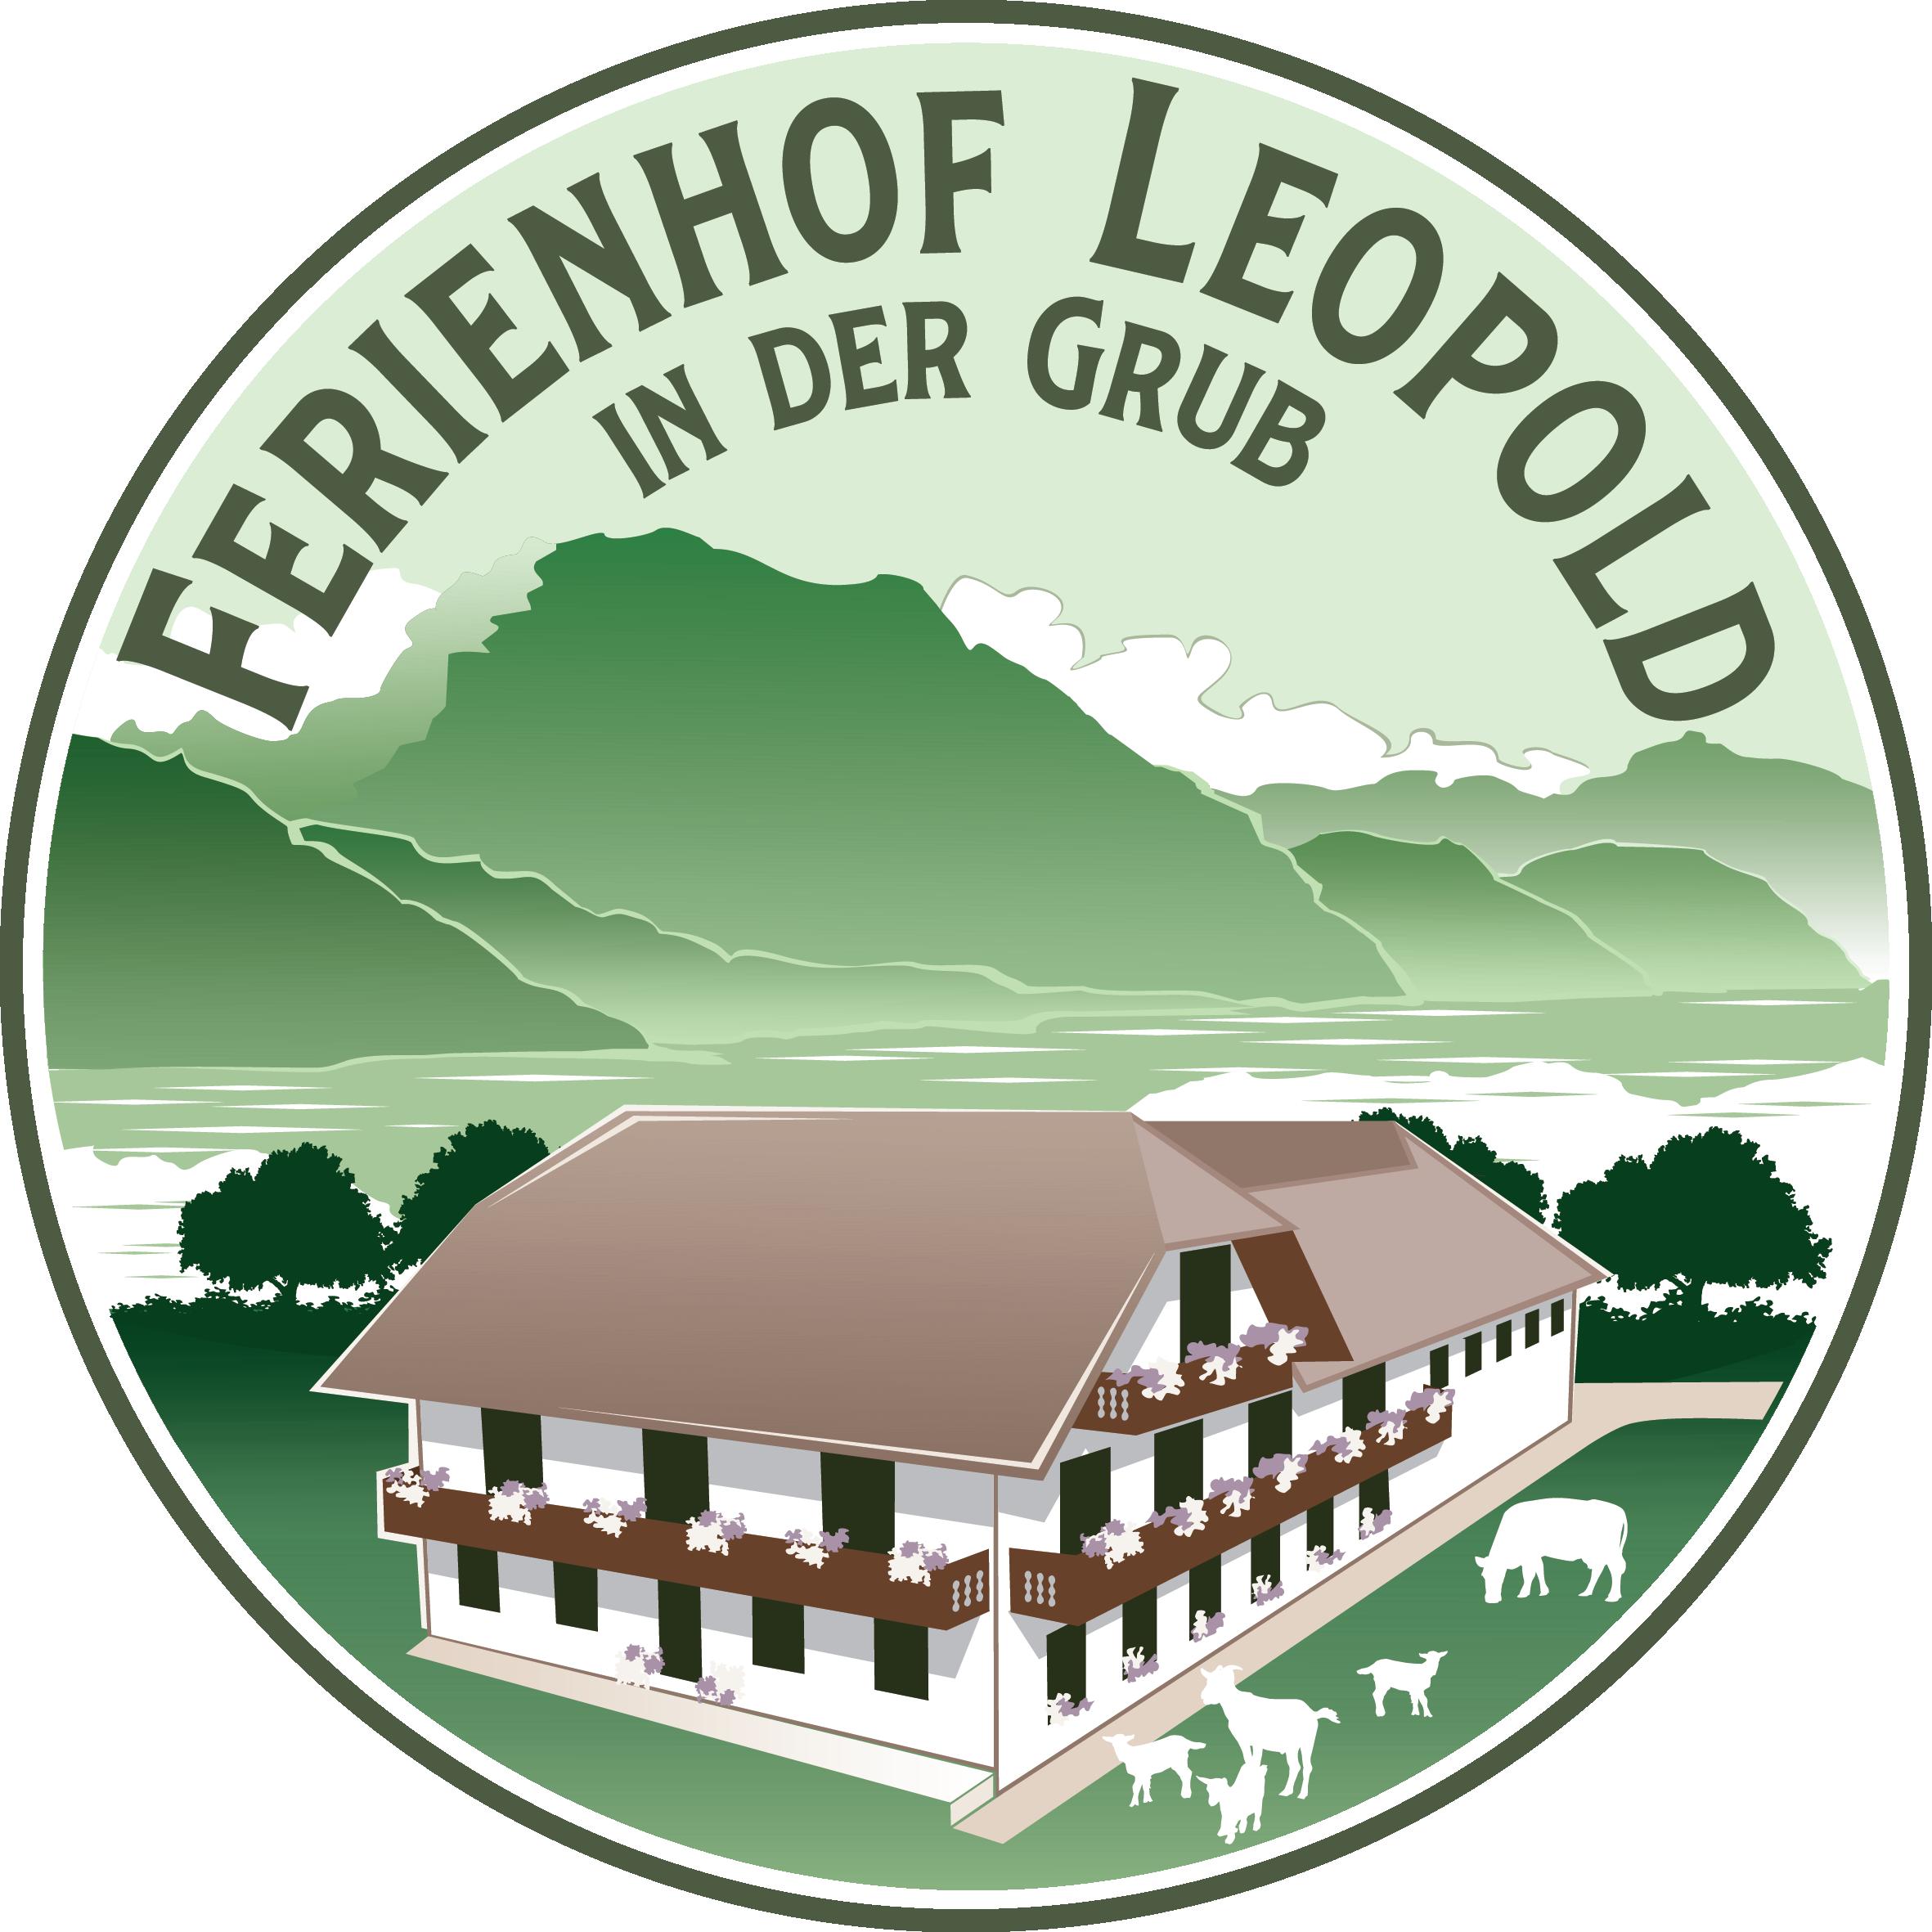 Ferienhof Leopold